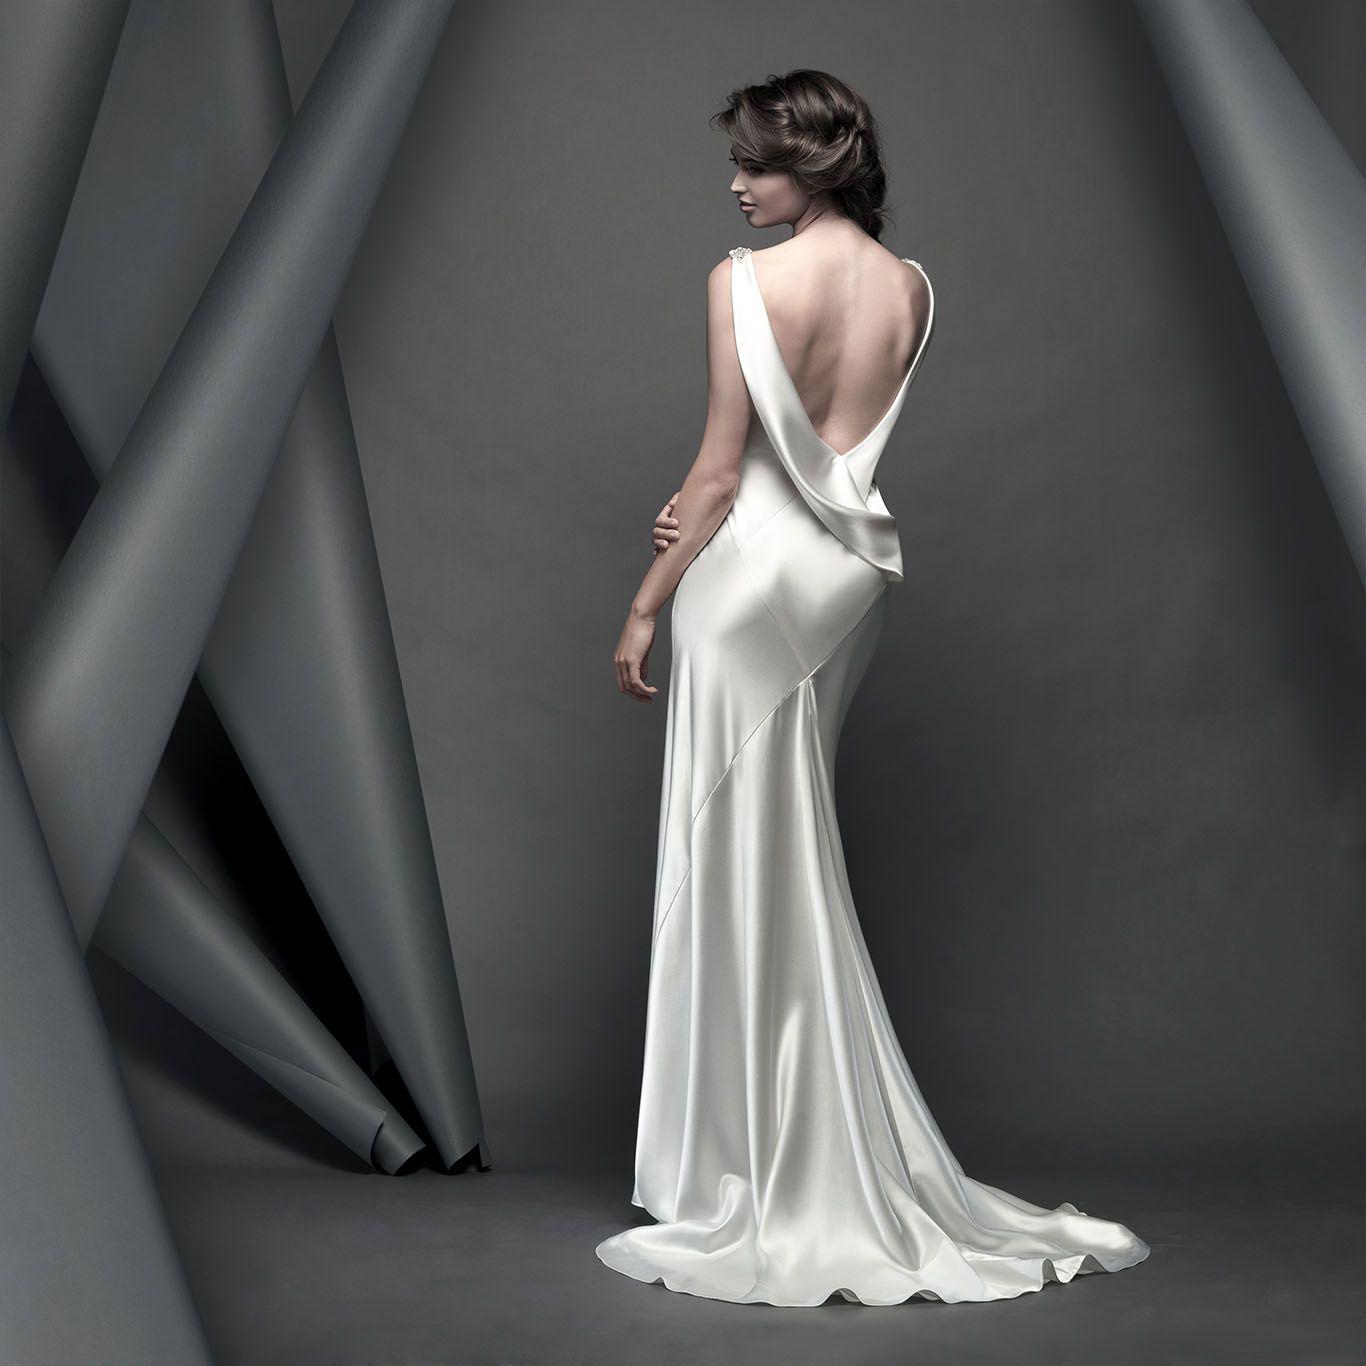 Novello collection suzanne neville wedding dresses wedding